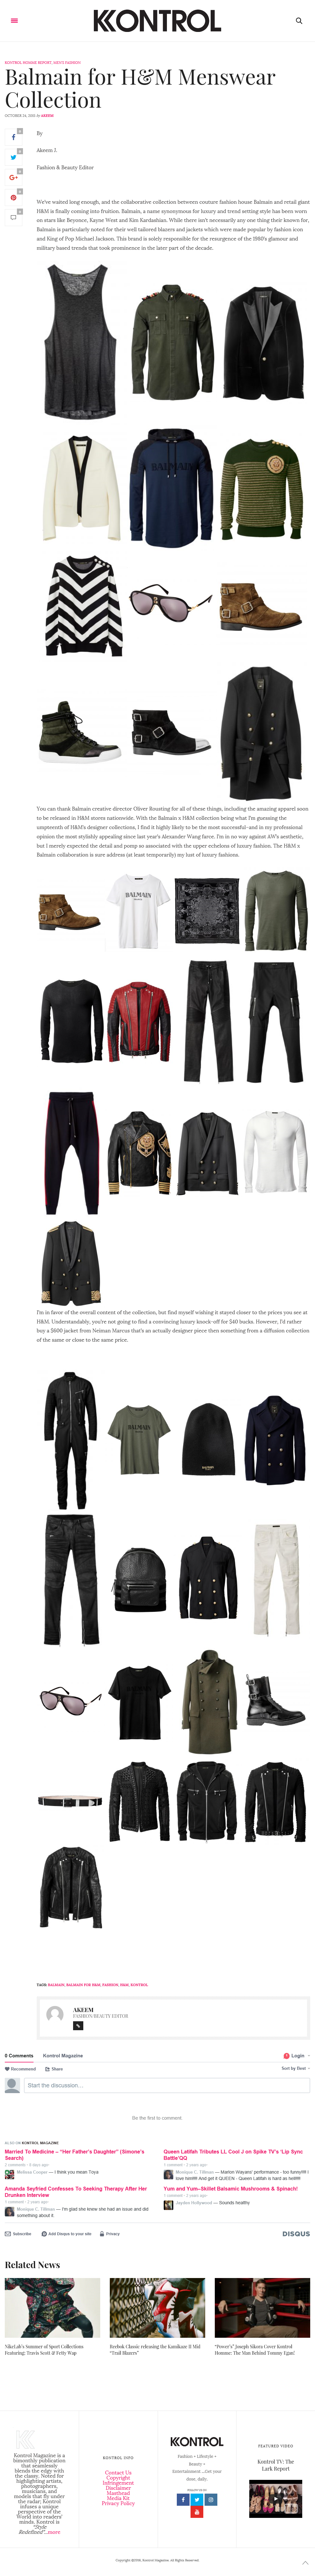 Balmain for H&M Menswear Collection--Kontrol Mag Oct 2015